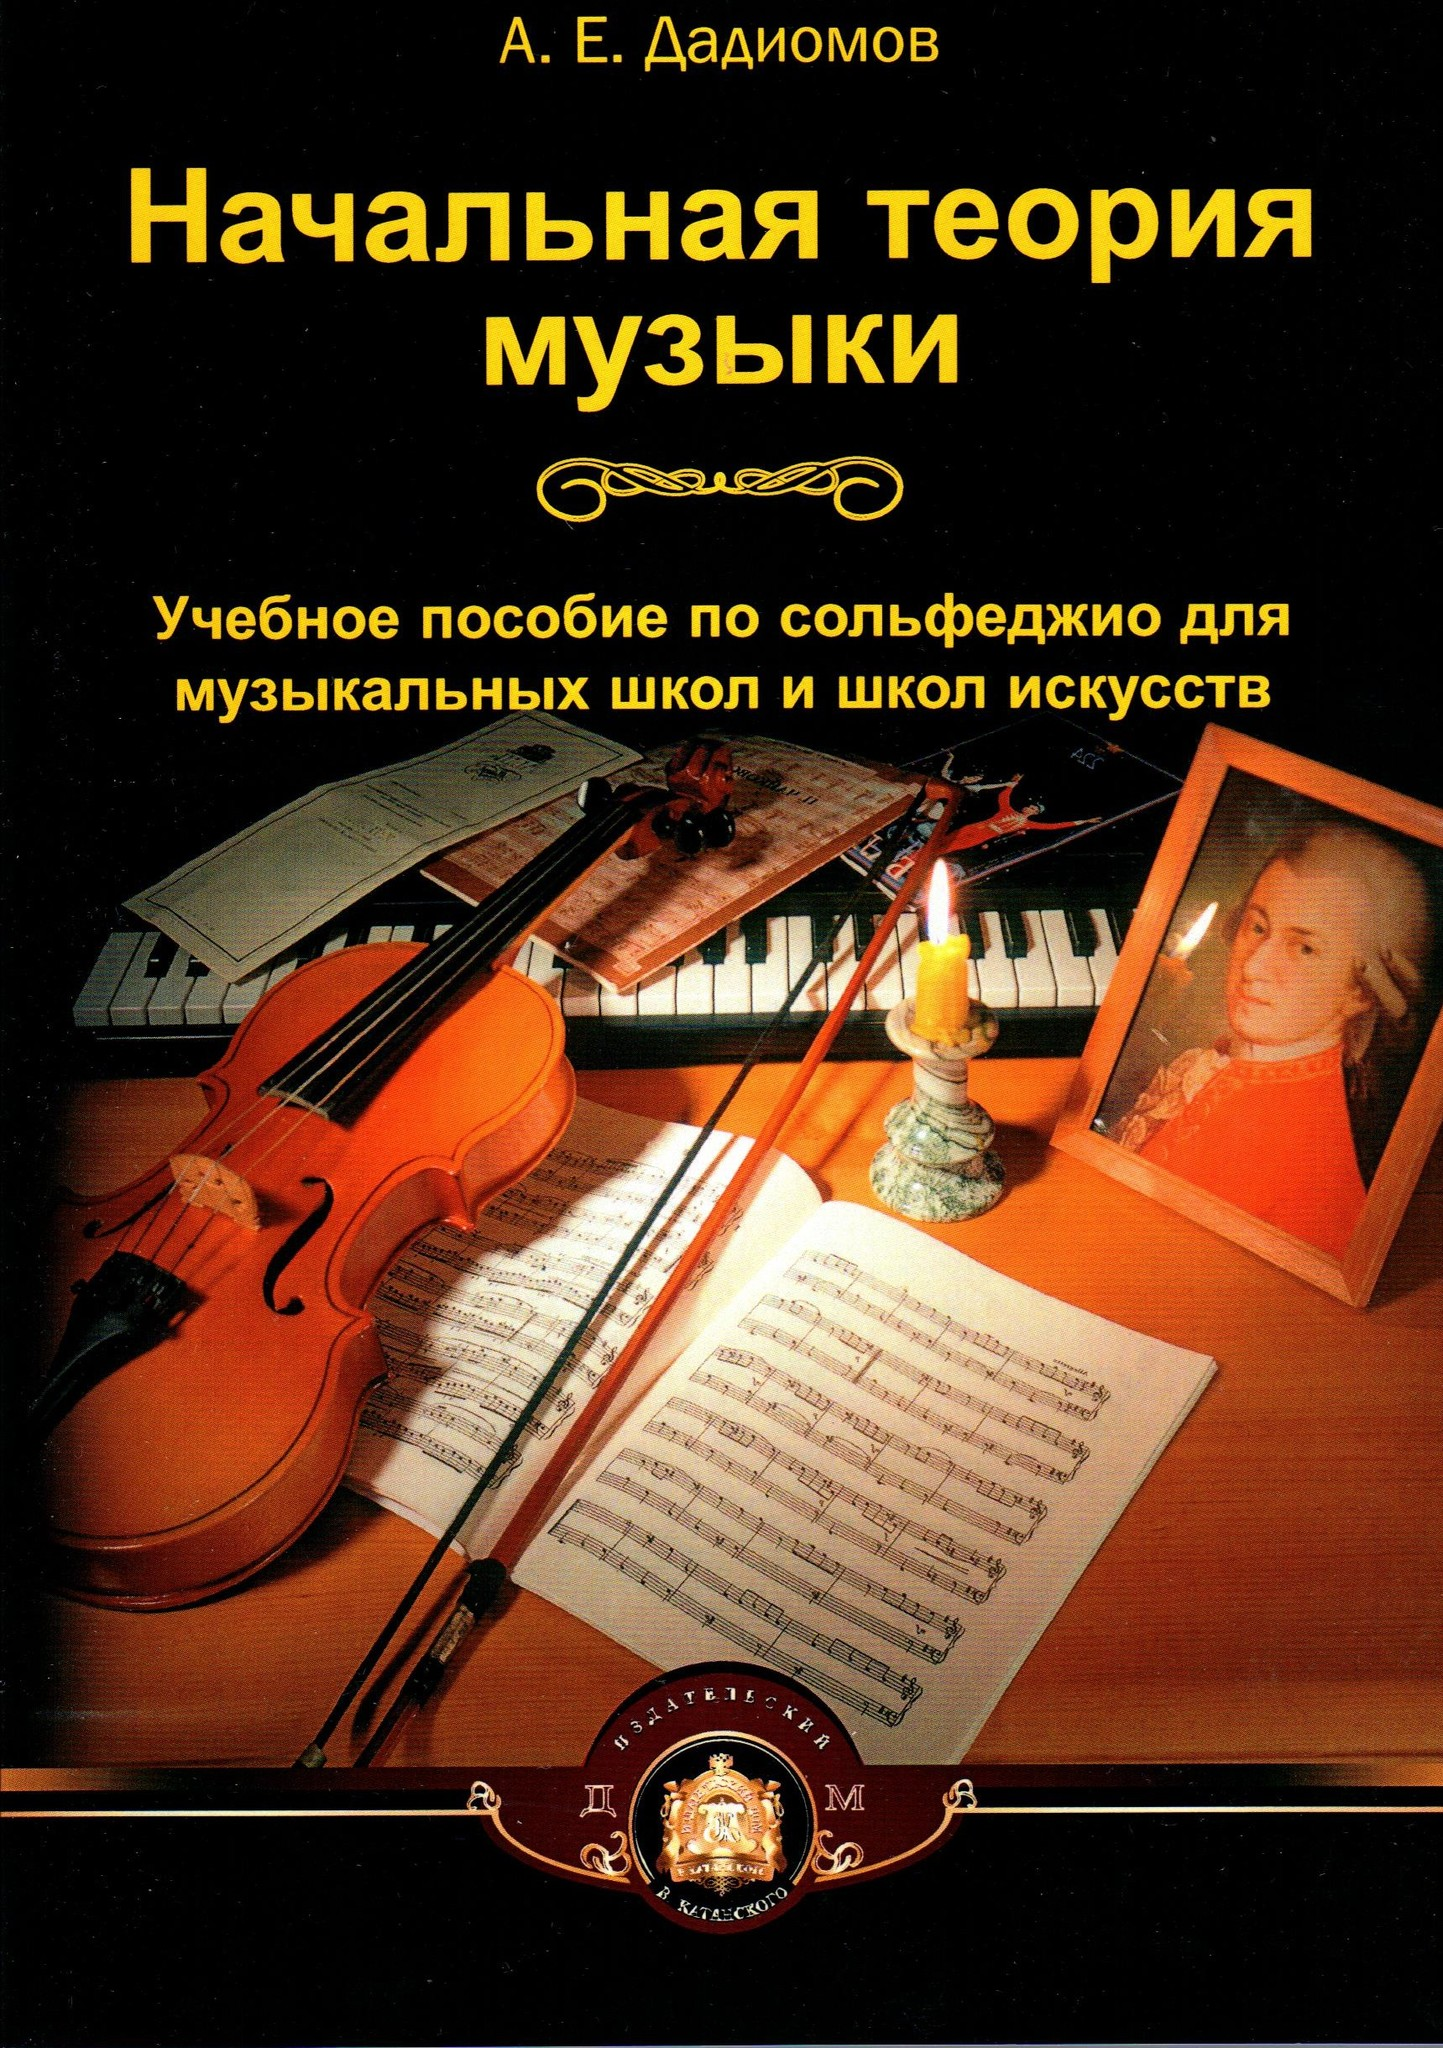 А. Е. Дадиомов. Начальная теория музыки.